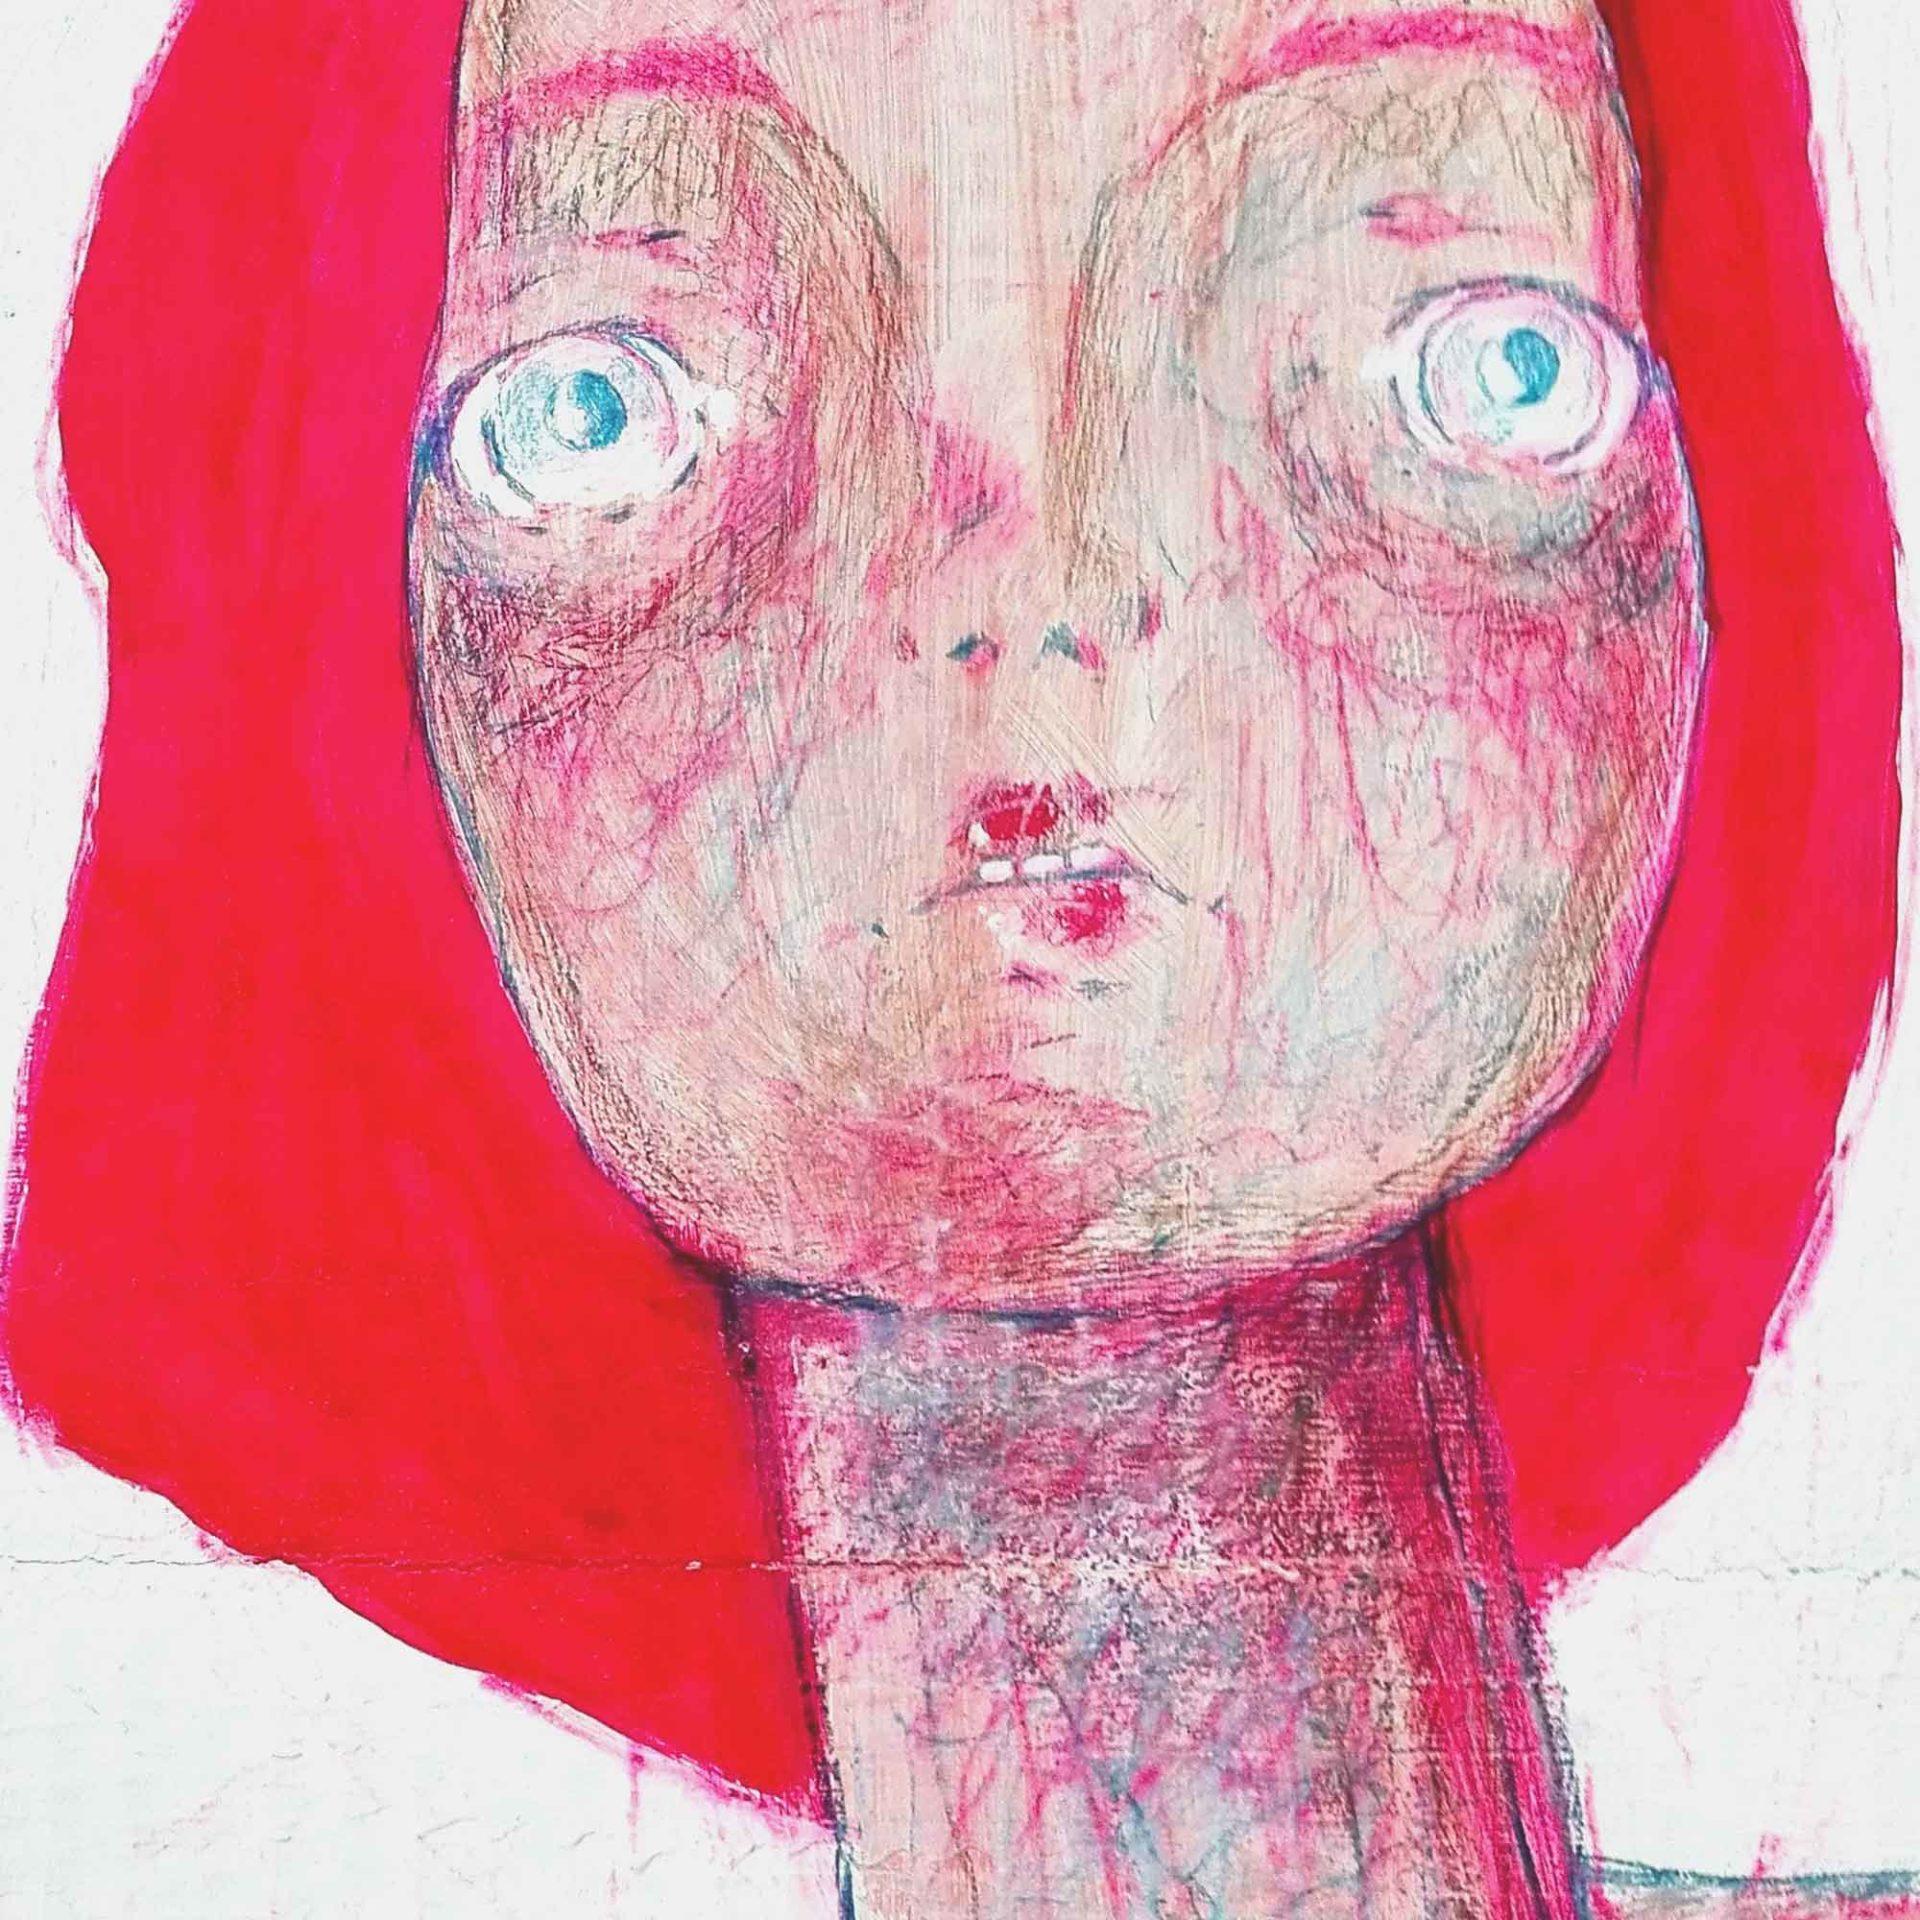 2015 Burnout Come stai Pittura Contemporanea Diego Gabriele